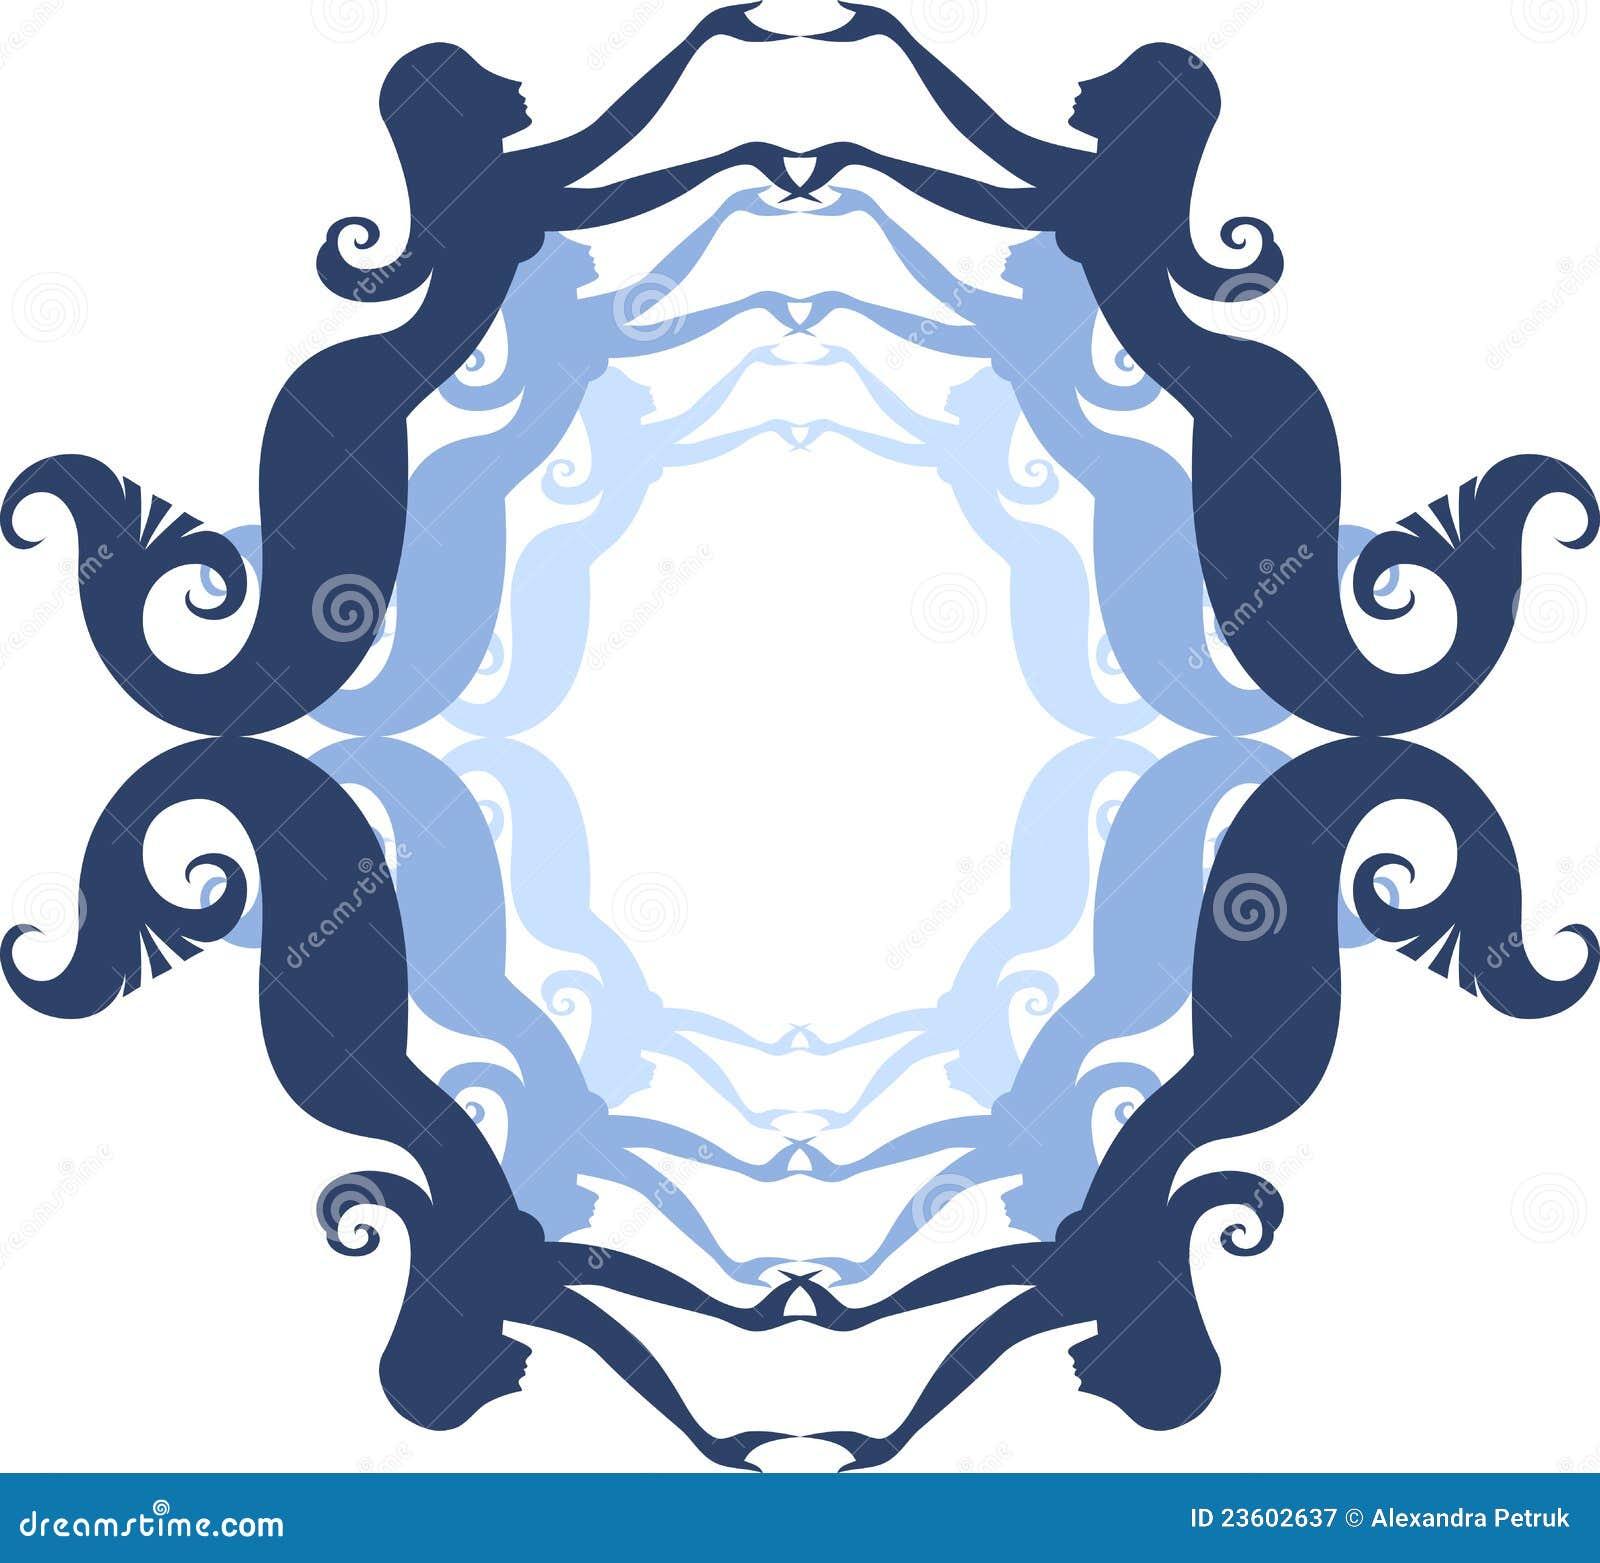 Mermaid frame stock vector. Illustration of body, sprite - 23602637